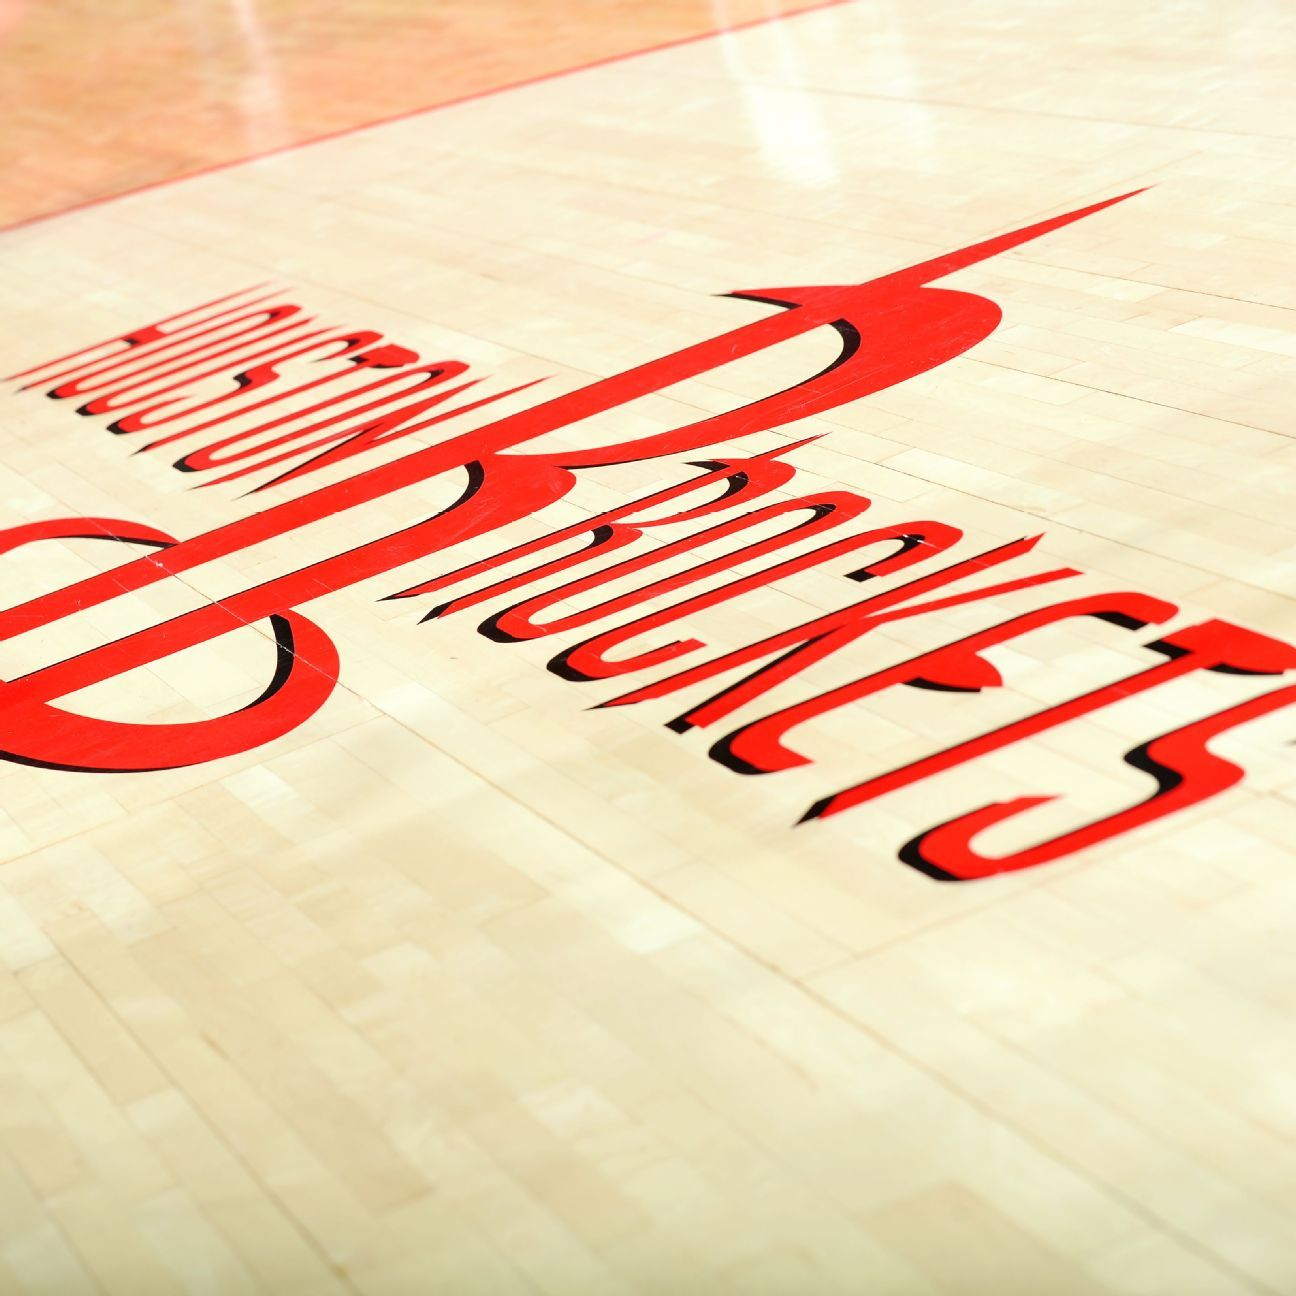 NBA on China-Rockets Rift: Open Flow of Ideas Key